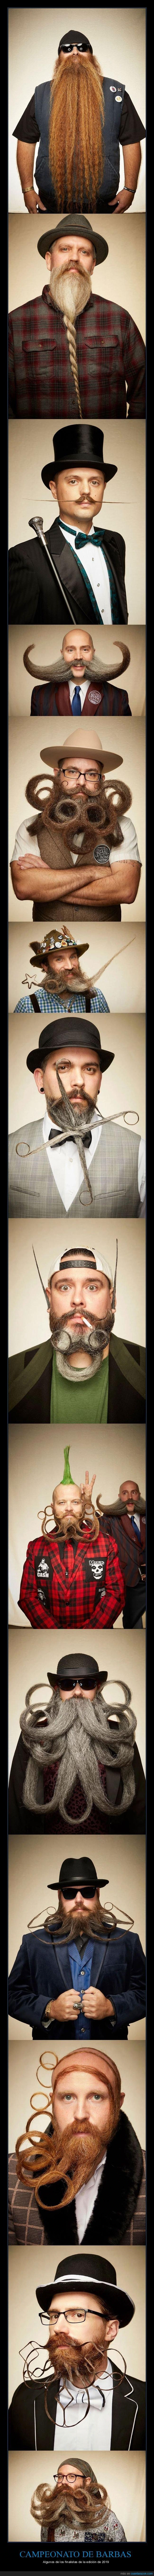 barbas,bigotes,campeonato